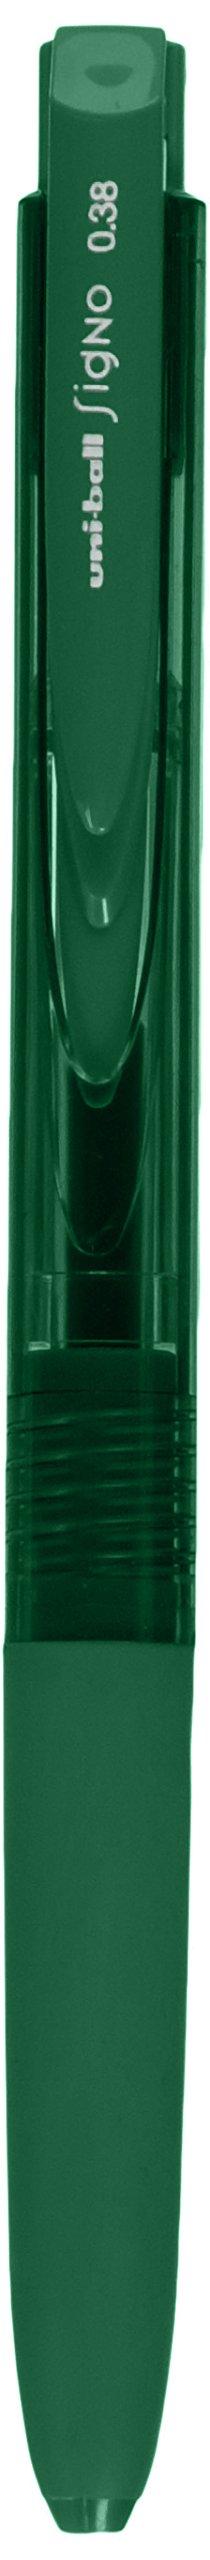 Uni Ball Signo Knock Ballpoint Pen RT1 0.38mm Color, Green..